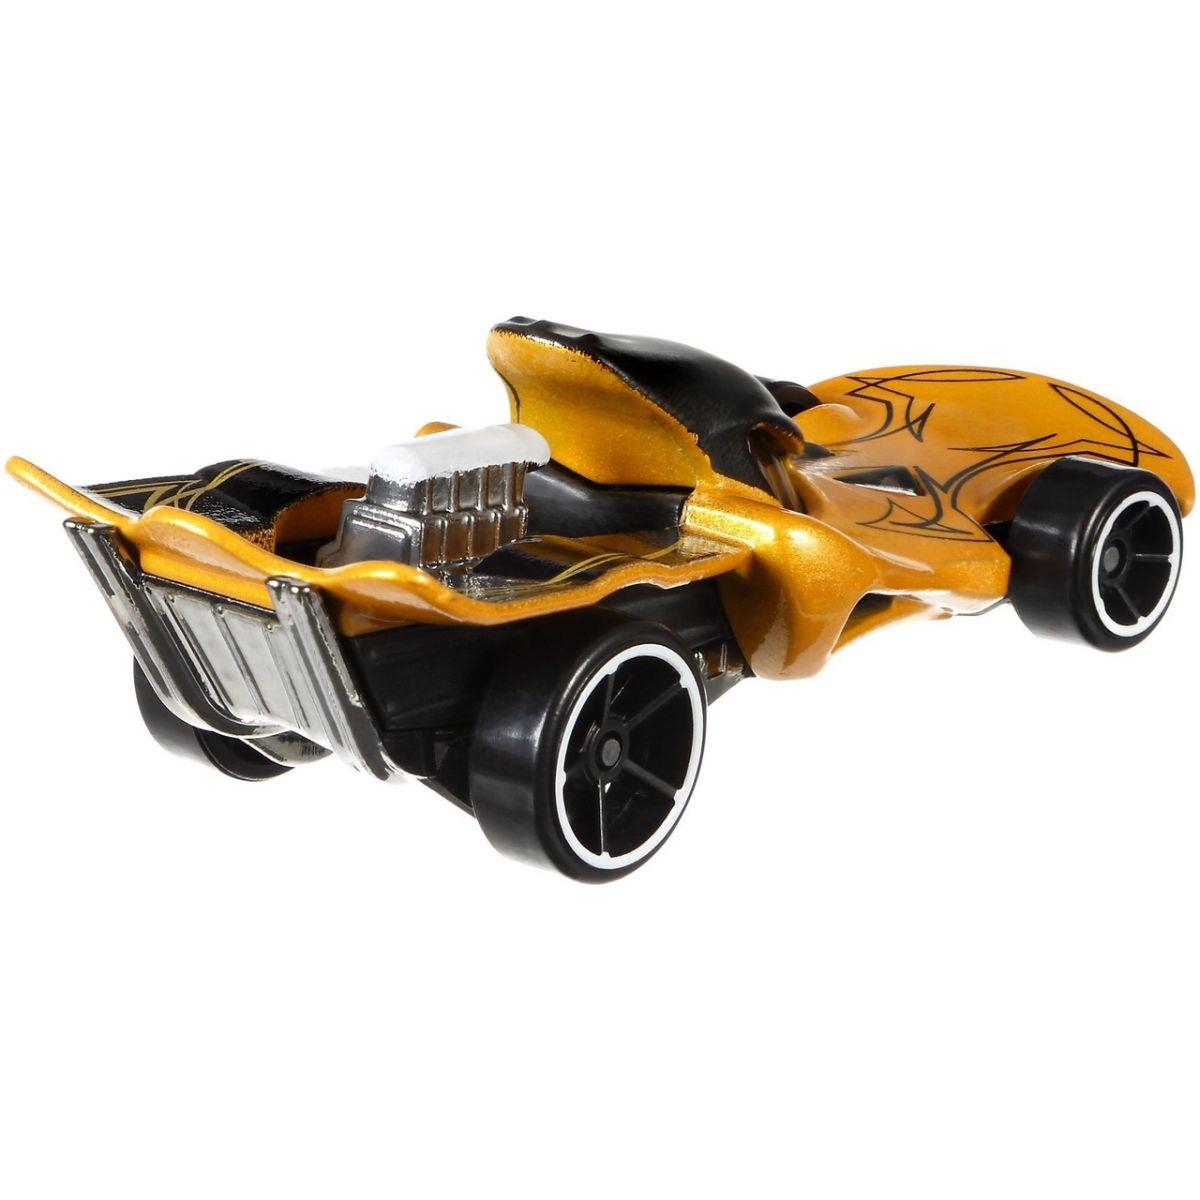 Daffy Duck (Patolino) - Hot Wheels